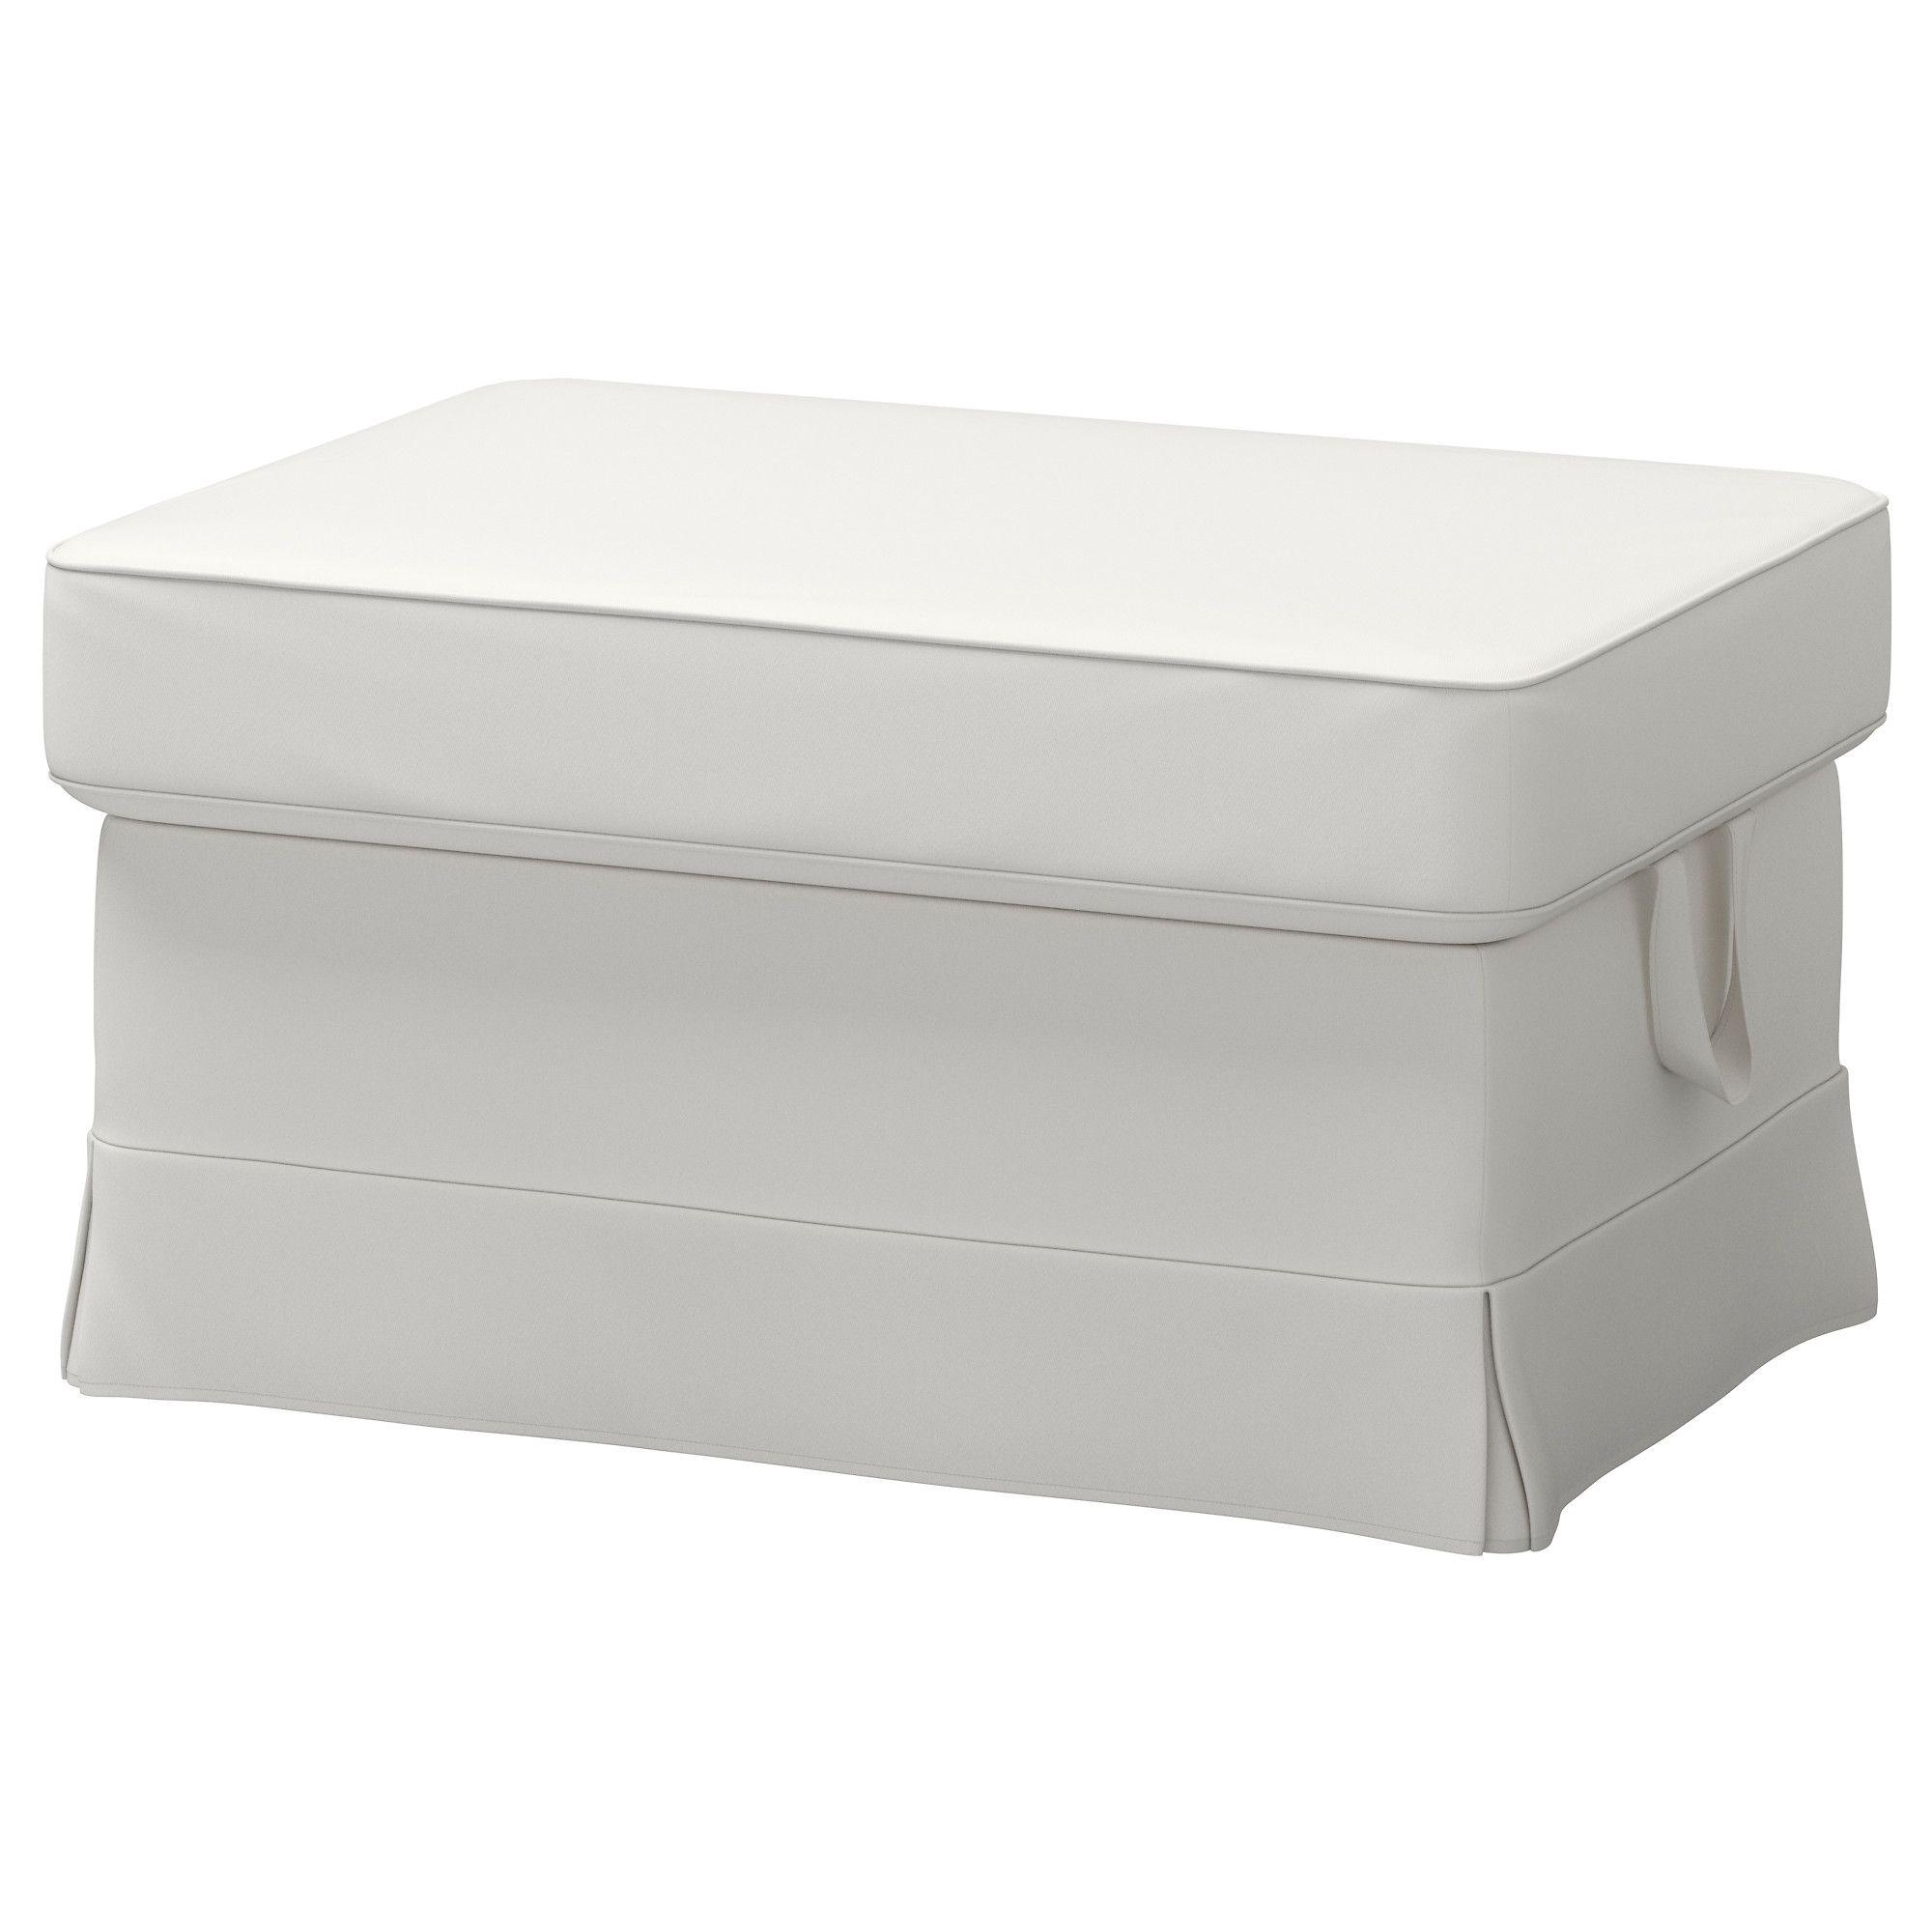 Ektorp Footstool Vittaryd White With Images Ikea Ektorp Quality Living Room Furniture Ikea Ottoman